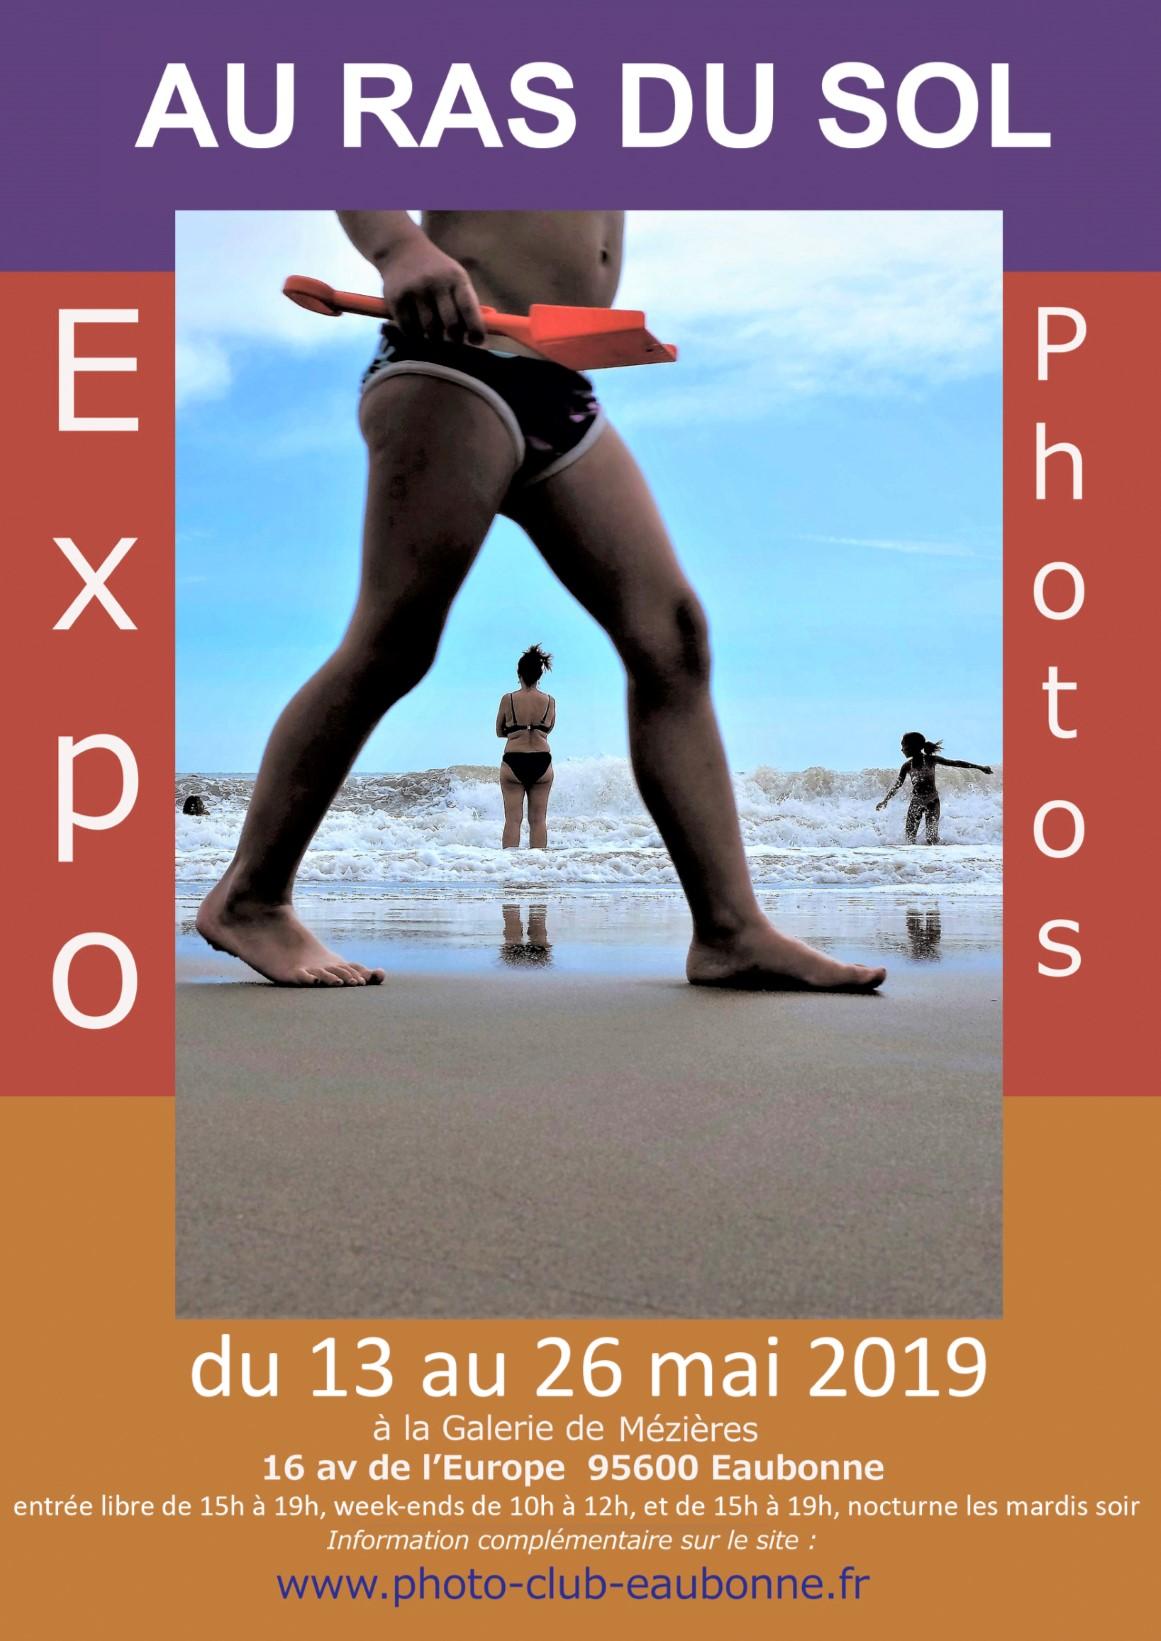 Exposition photos Photo Club Eaubonne